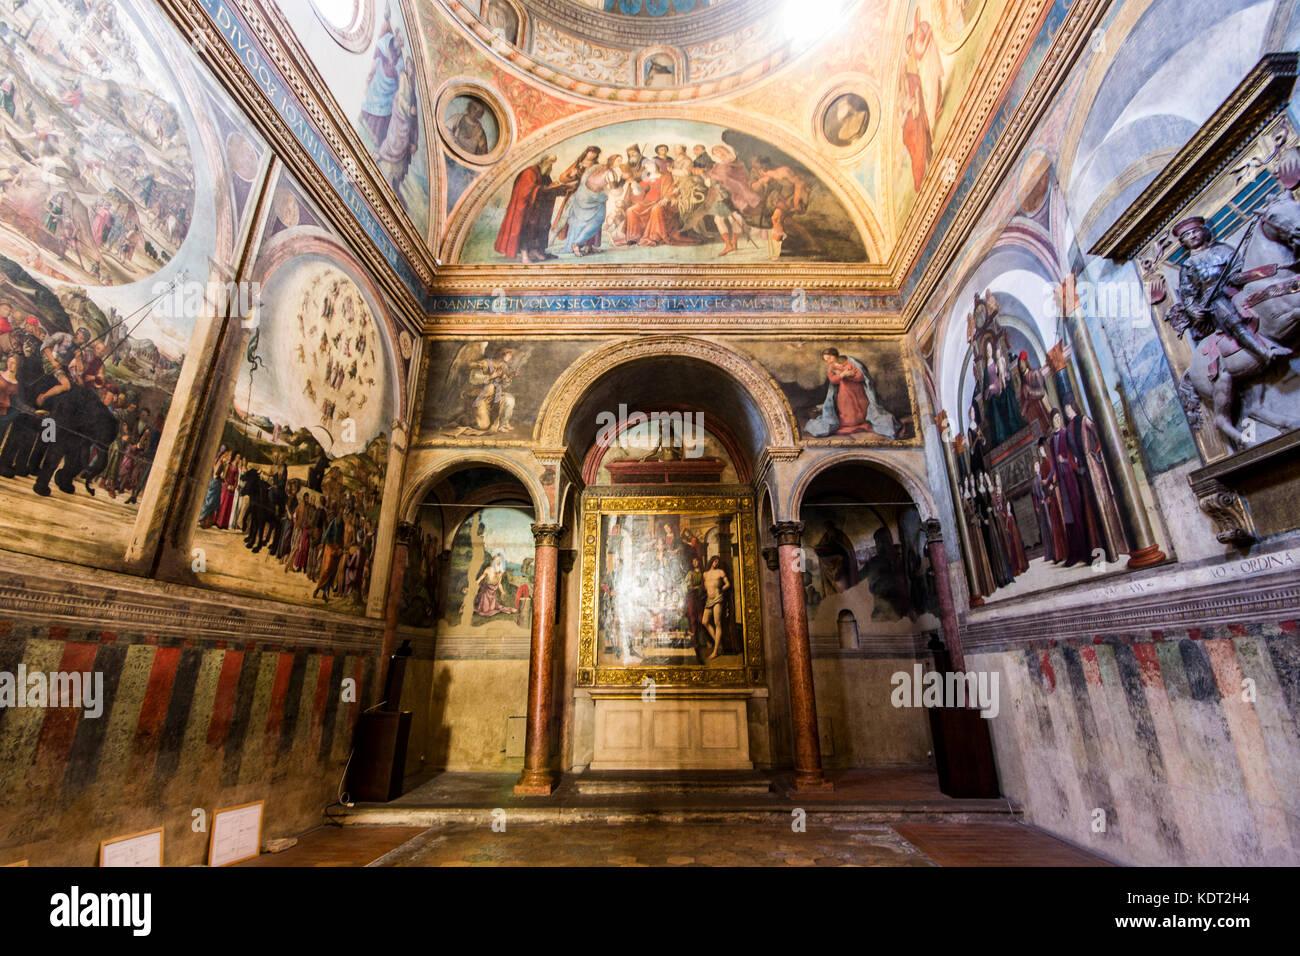 https://c8.alamy.com/comp/KDT2H4/the-basilica-of-san-giacomo-maggiore-an-historic-roman-catholic-church-KDT2H4.jpg